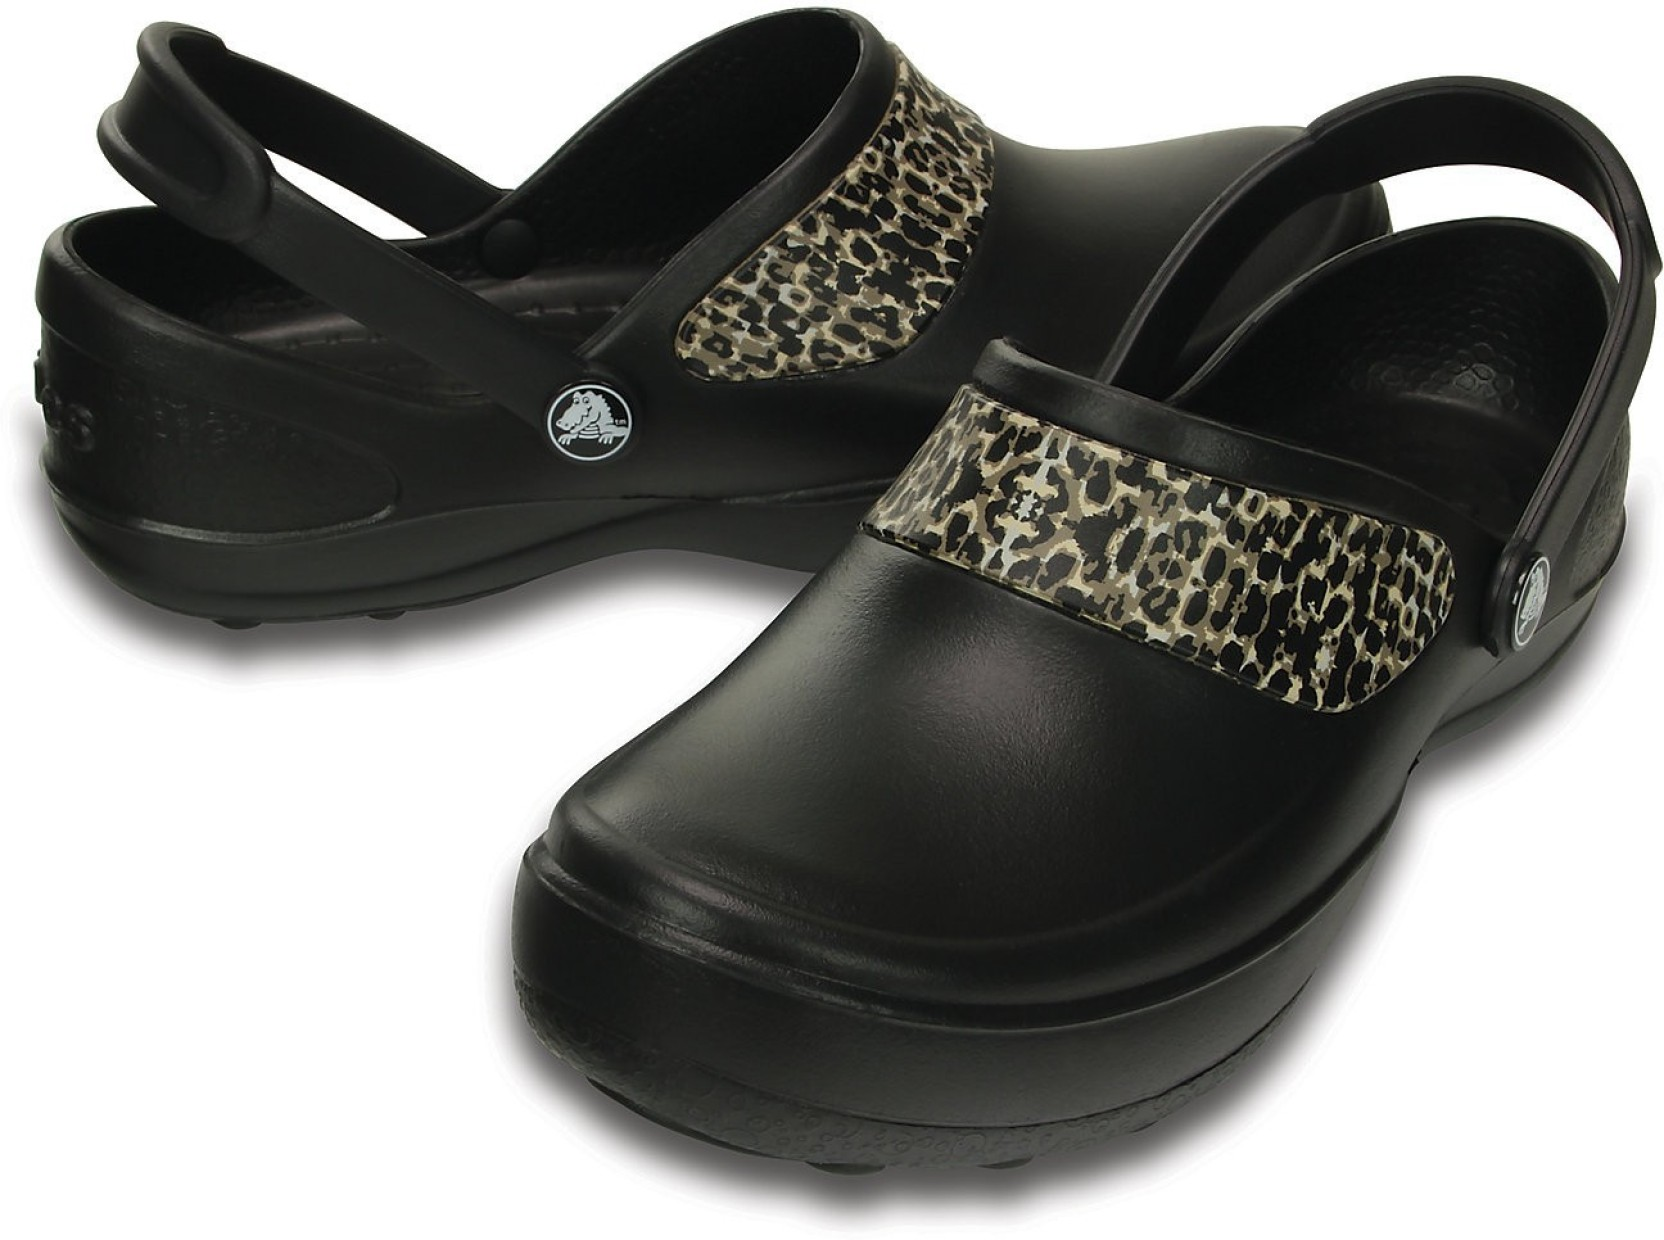 636f54f12 Crocs Women Black Clogs - Buy 10876-072 Color Crocs Women Black ...